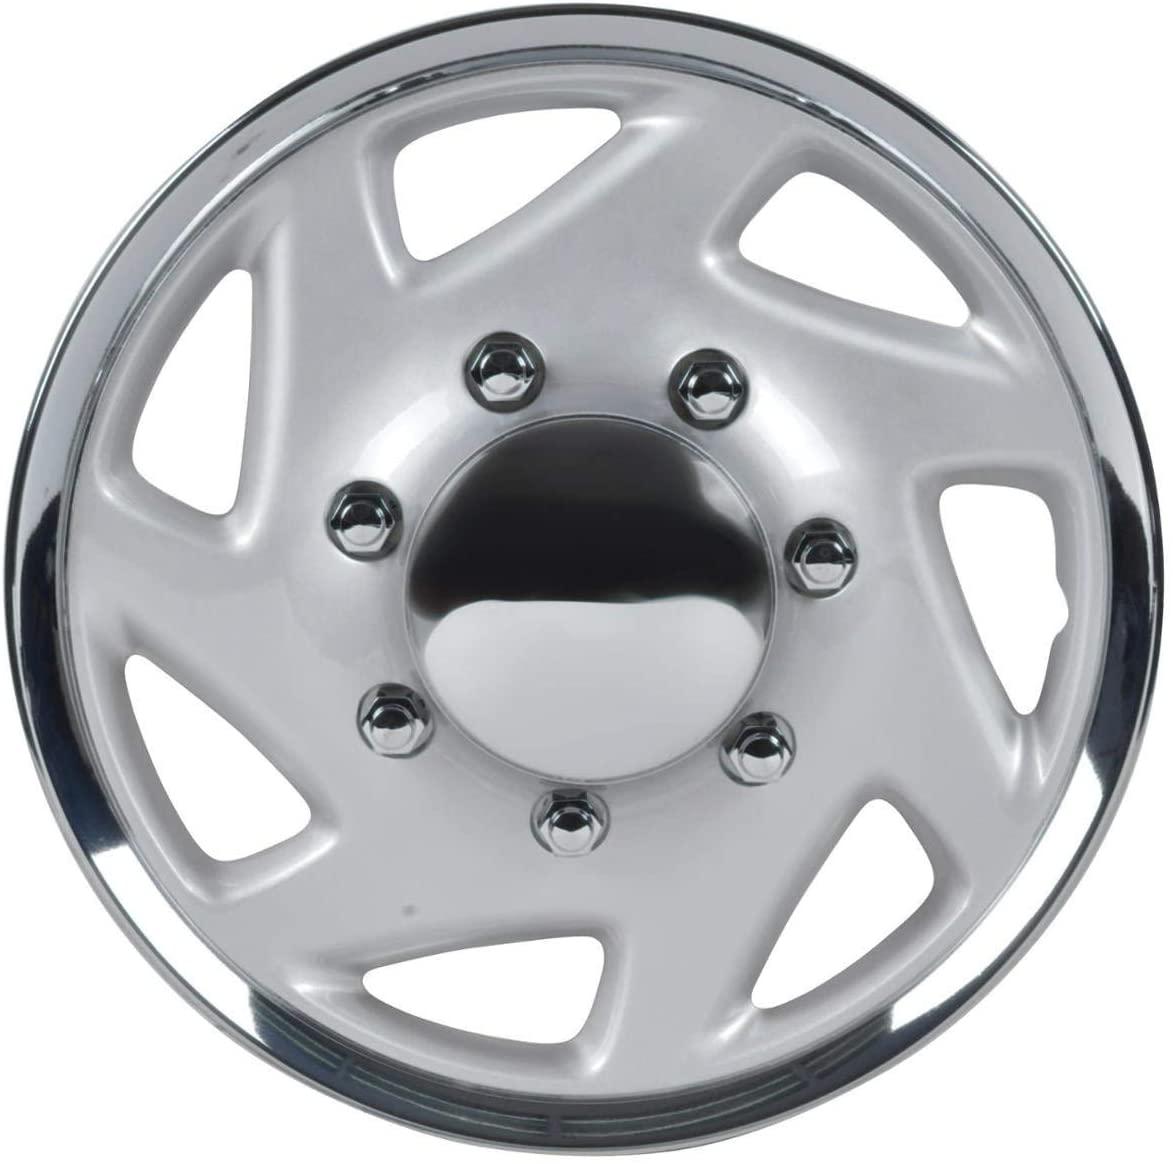 BDK (1Pc Replacement) Premium 16 Inch Hubcap 16